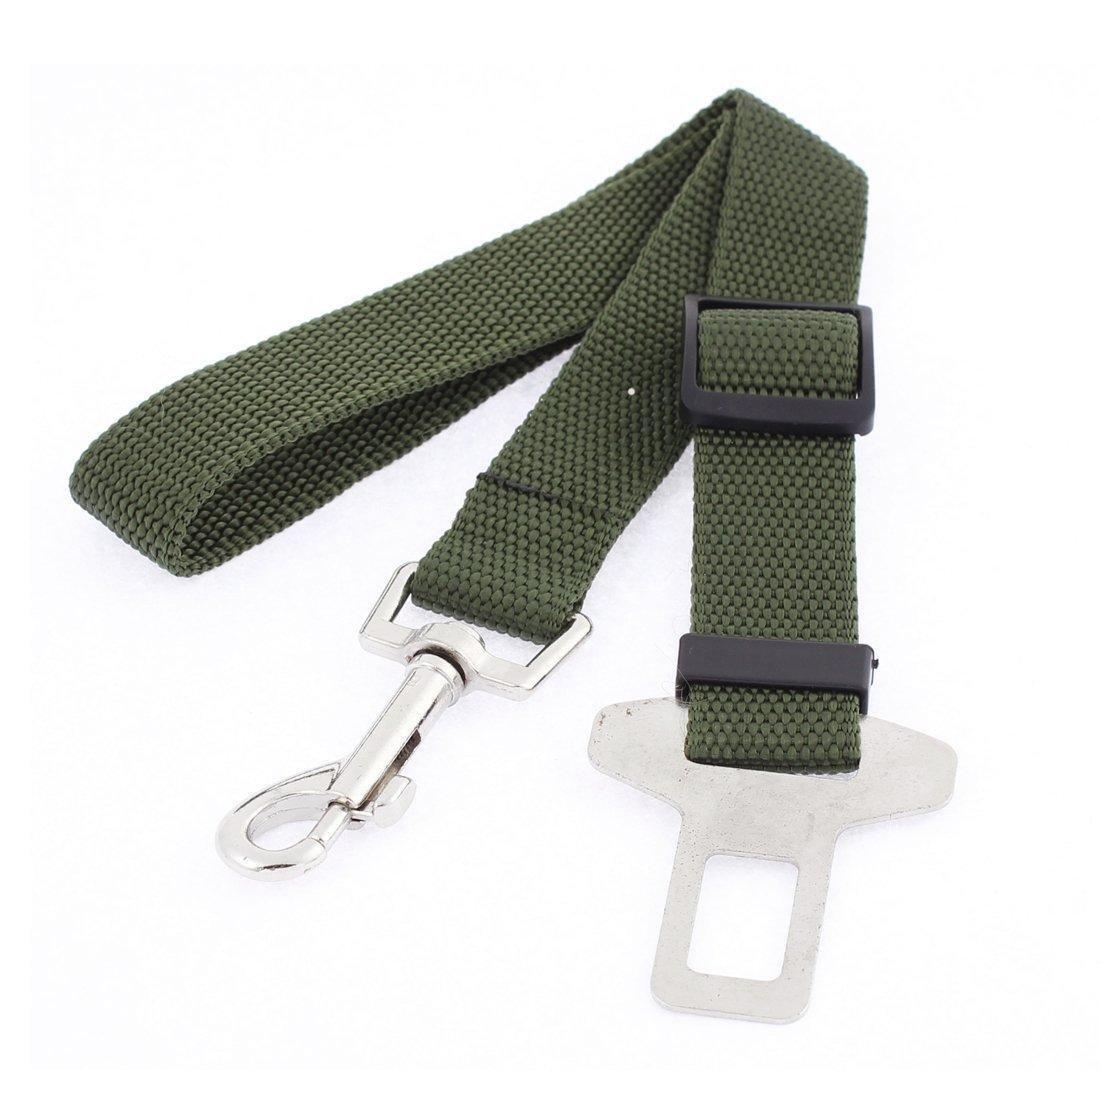 Ducomi 647903003044Cinturón de Seguridad Ajustable de Nailon para Perro con mosquetón, Verde Militar